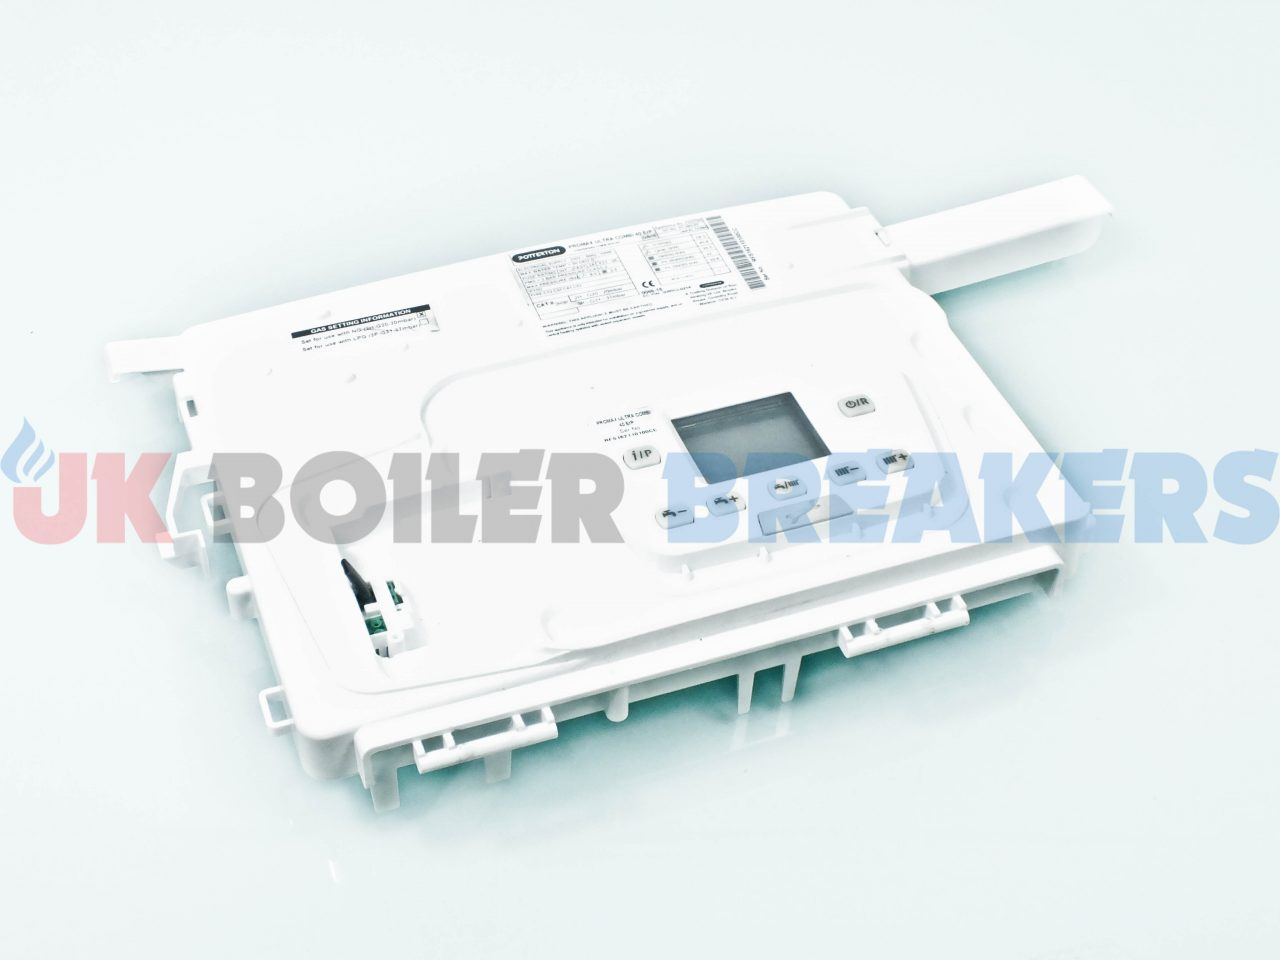 Potterton Control Box with PCB 720878202 GC- 47-393-57